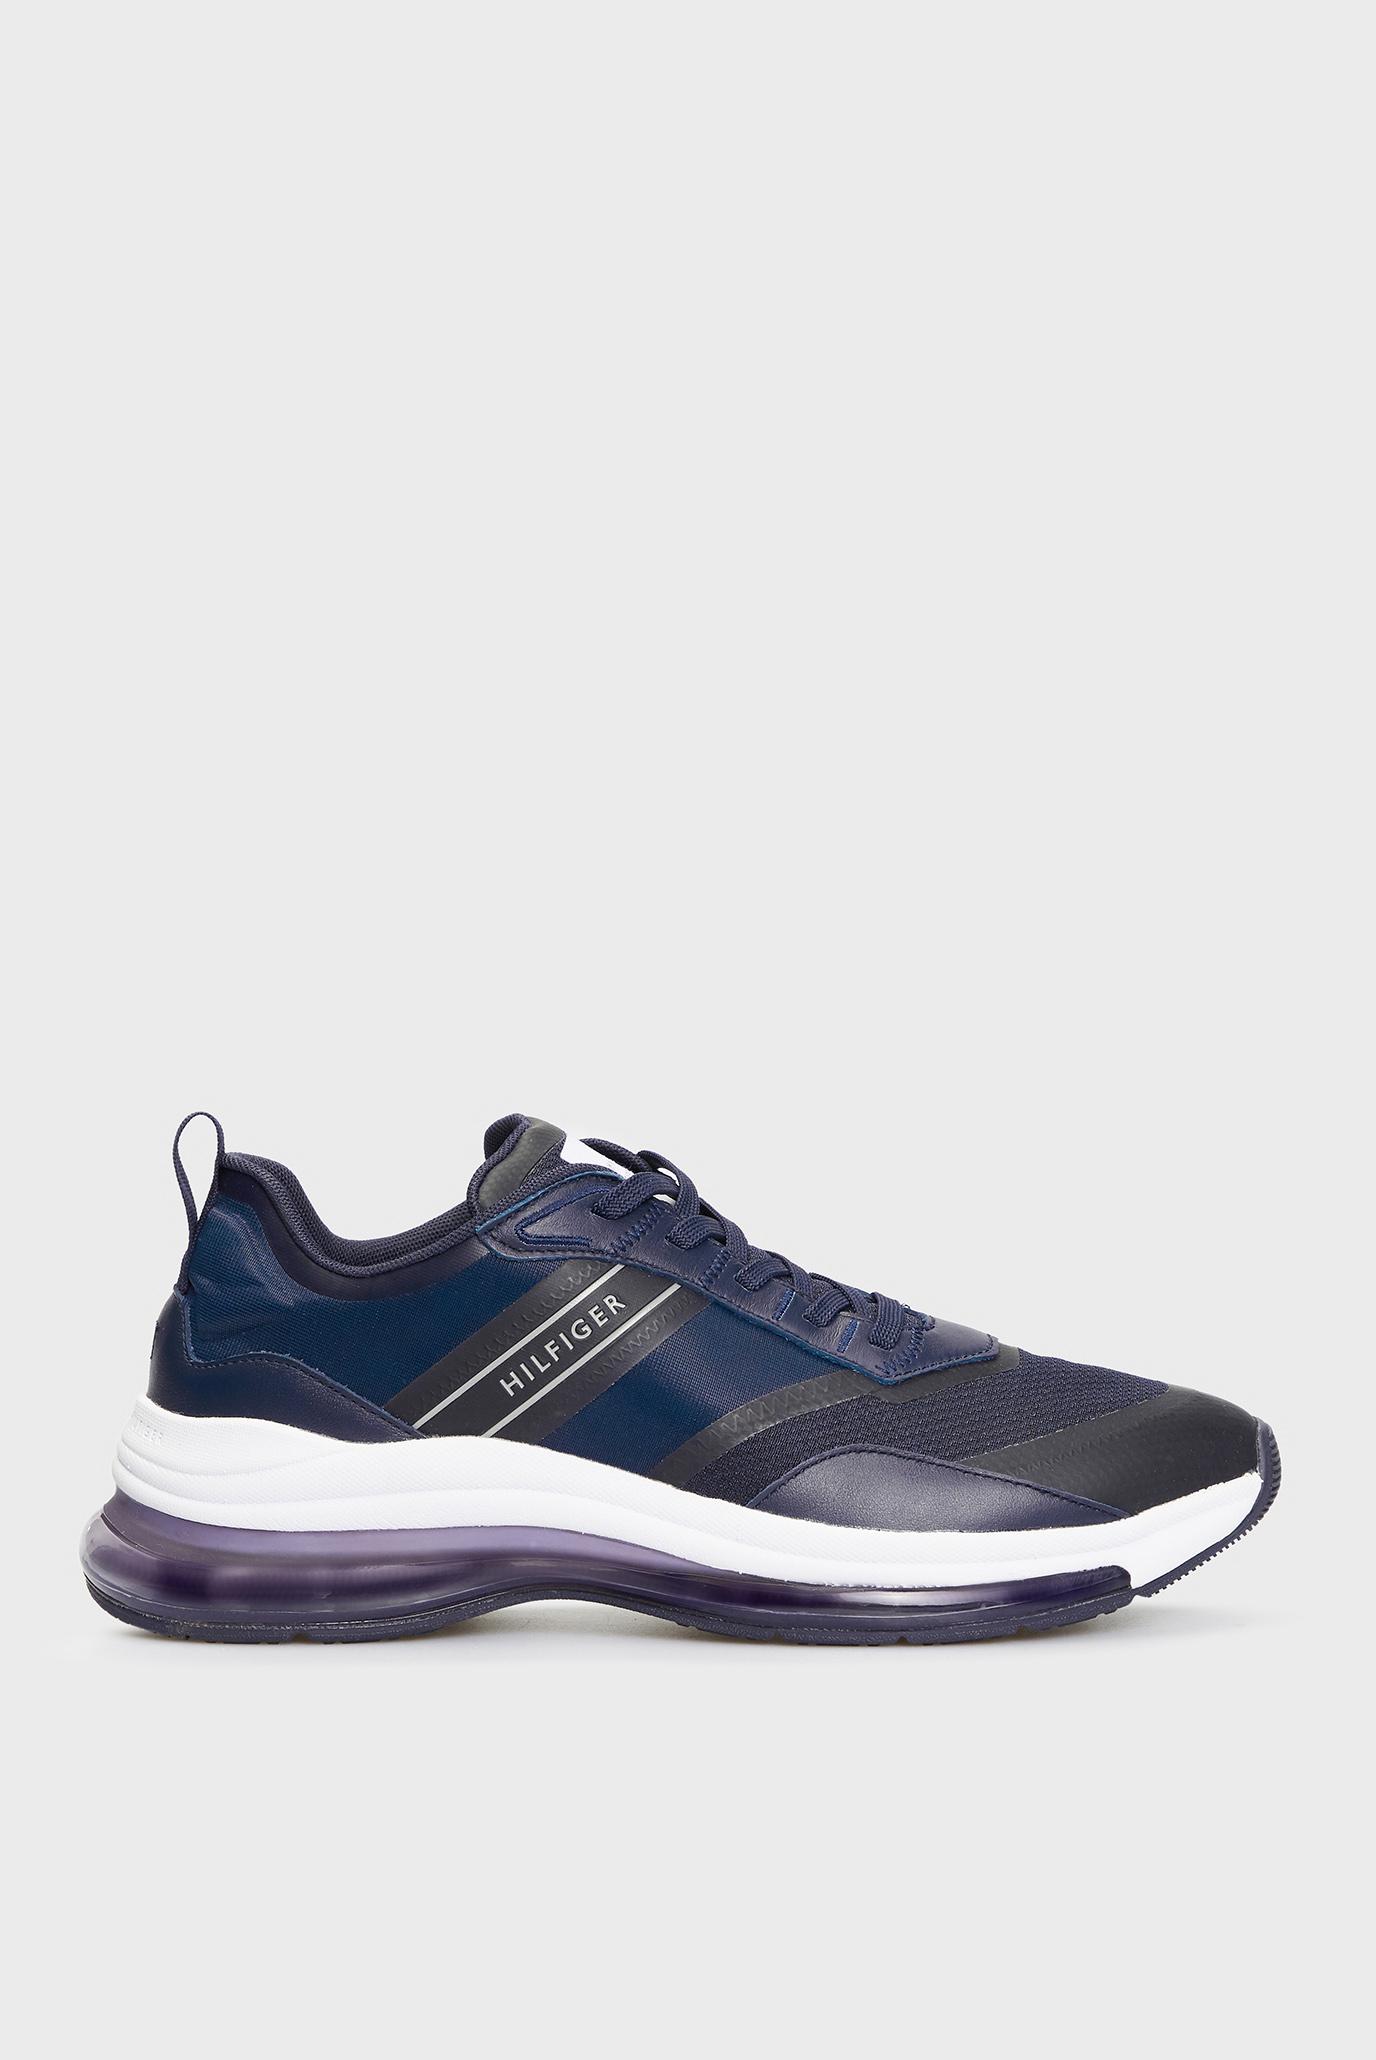 Мужские синие кроссовки AIR RUNNER 1